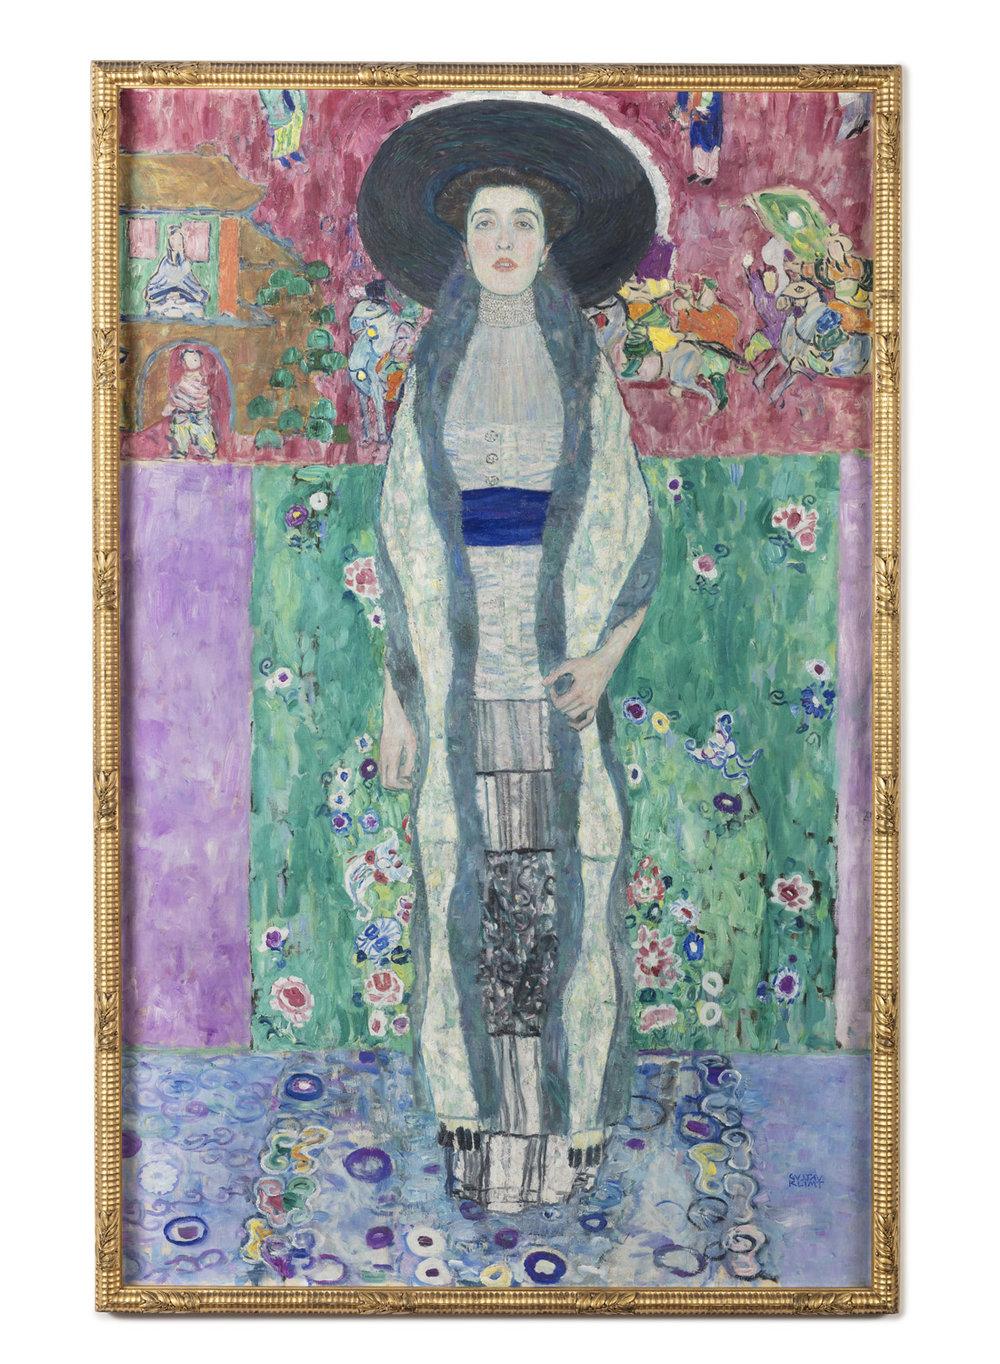 Portrait of Adele Bloch-Bauer II, Gustav Klimt. Photographed for Neue Galerie, New York.